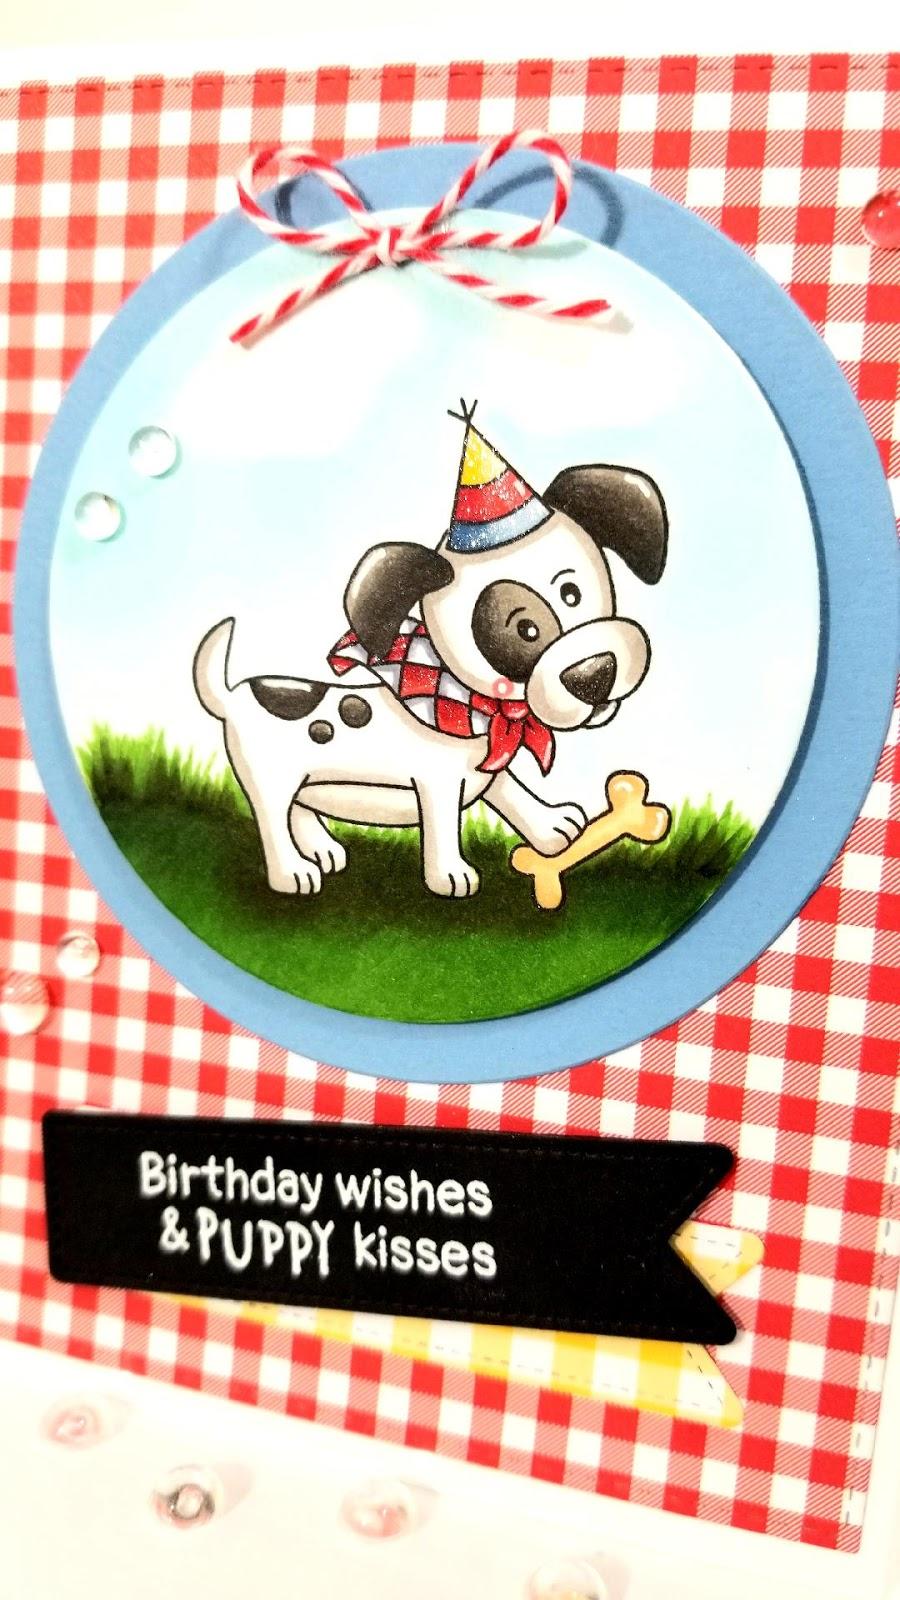 Birthday Wishes & Puppy Kisses Card by February Guest Designer Lori U'ren | Puppy Playtime Stamp Set by Newton's Nook Designs #newtonsnook #handmade